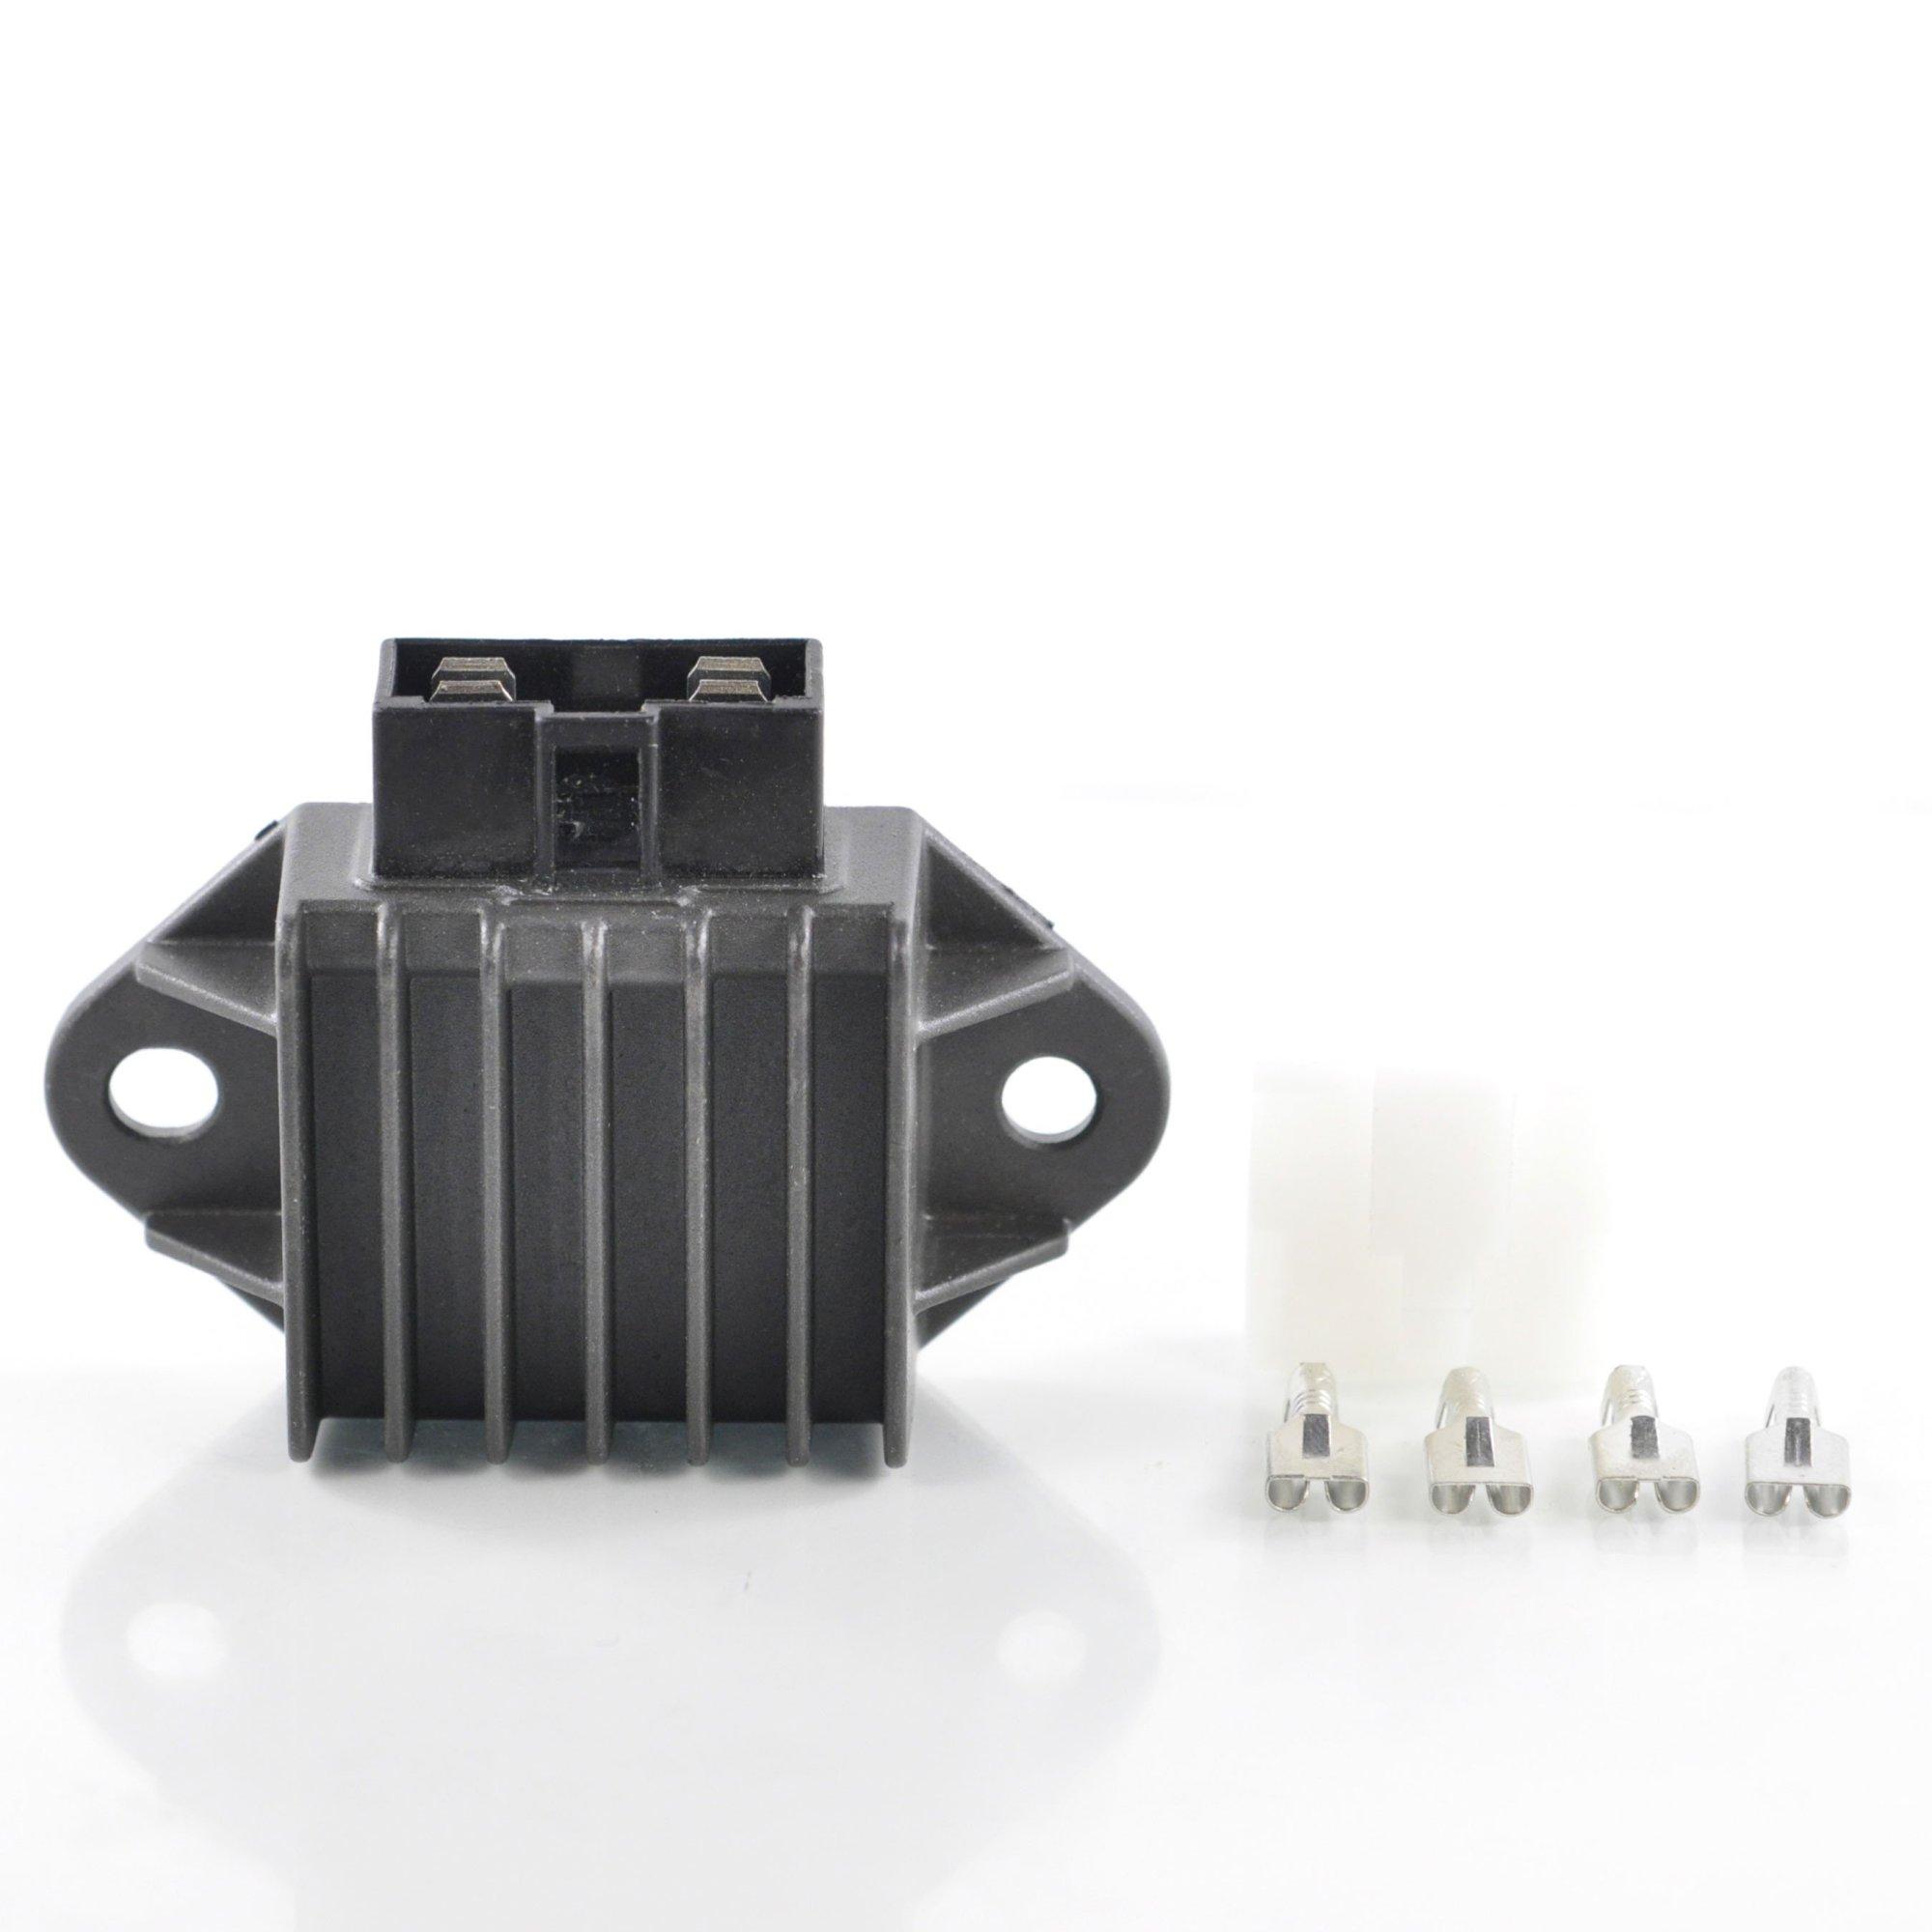 hight resolution of regulator rectifier honda crf250r crf450r crf 250 450 r moto electrical